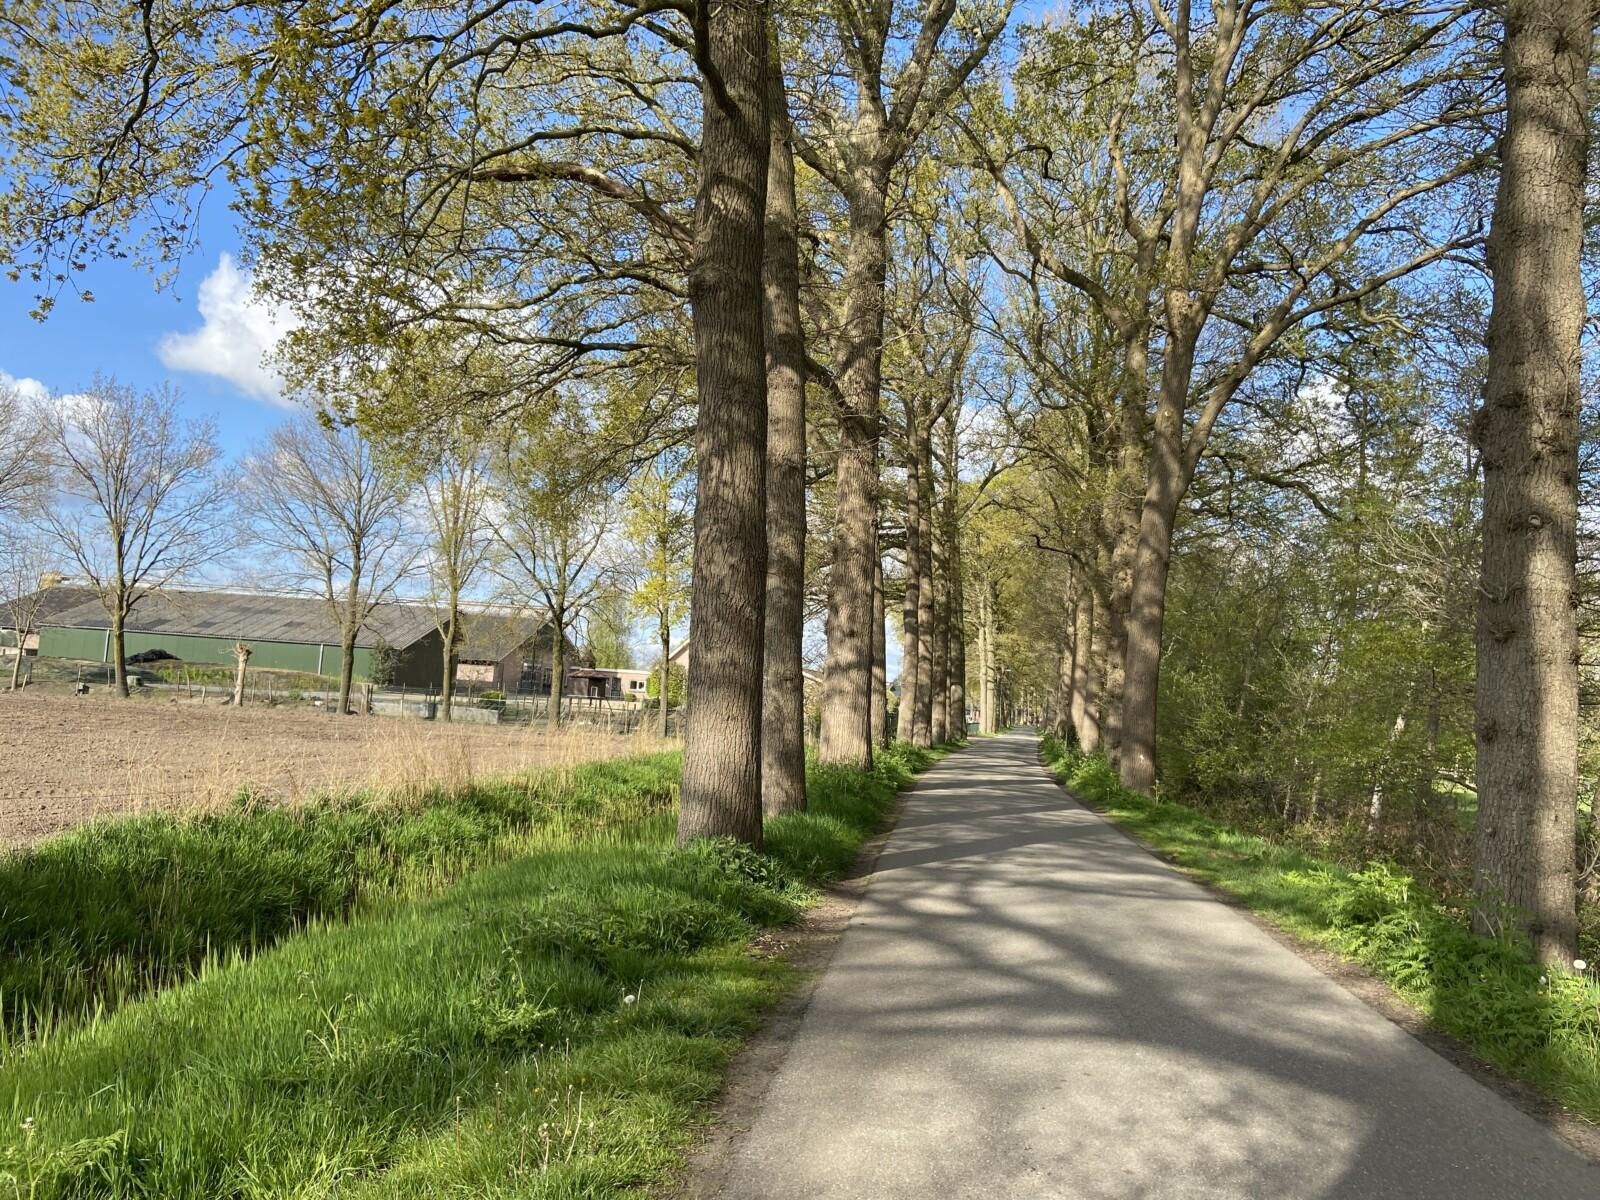 Rondje Overberg - Renswoude